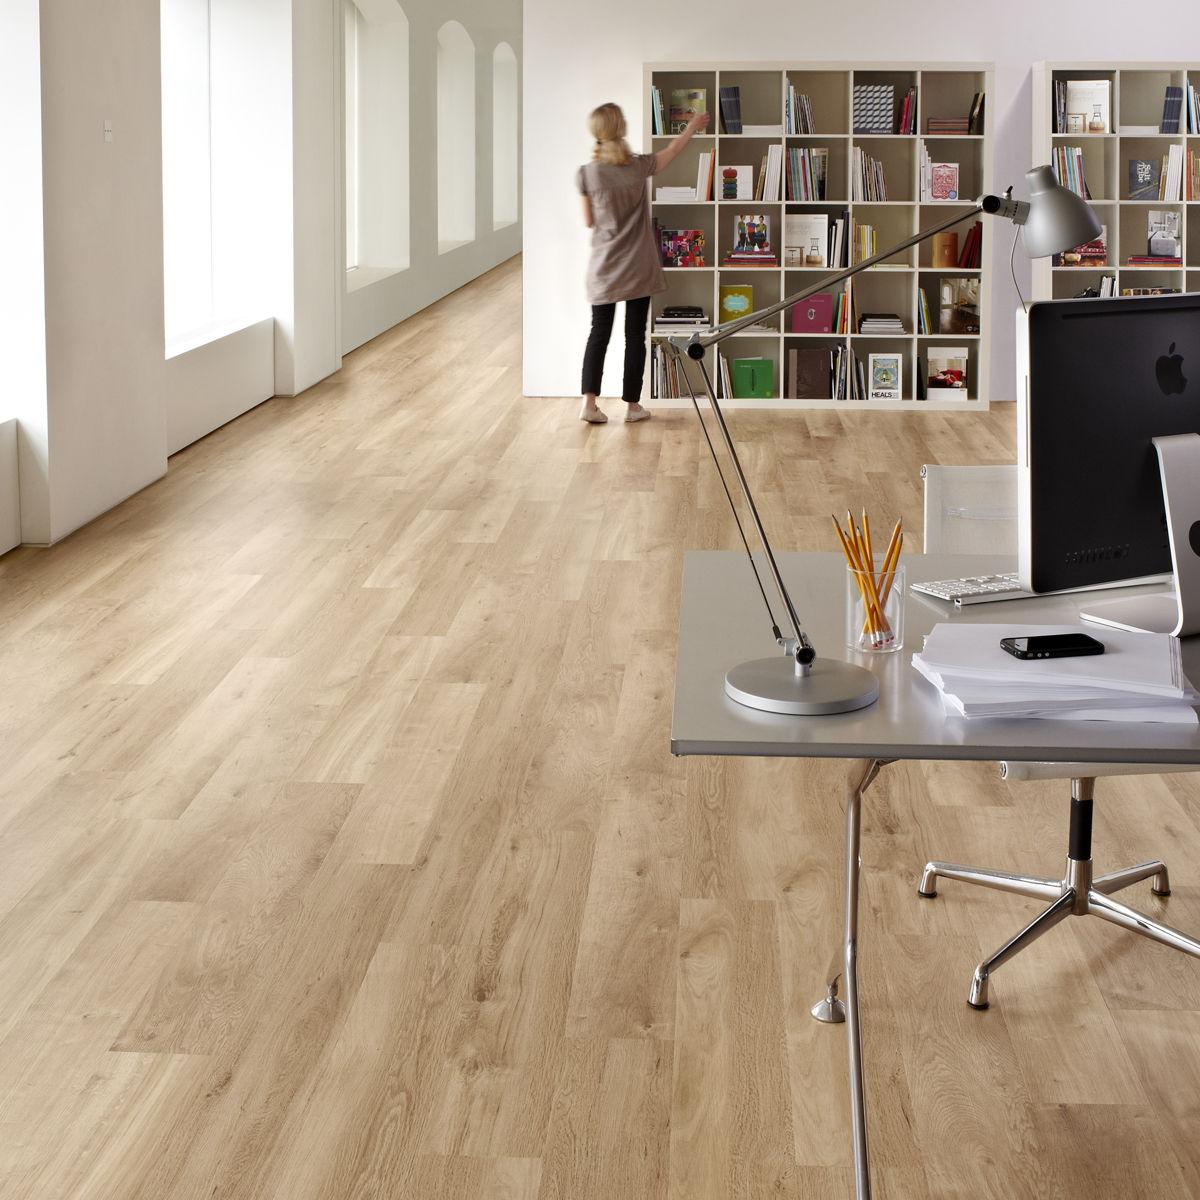 Karndean van gogh flooring reviews 5 things you most for Floor in french